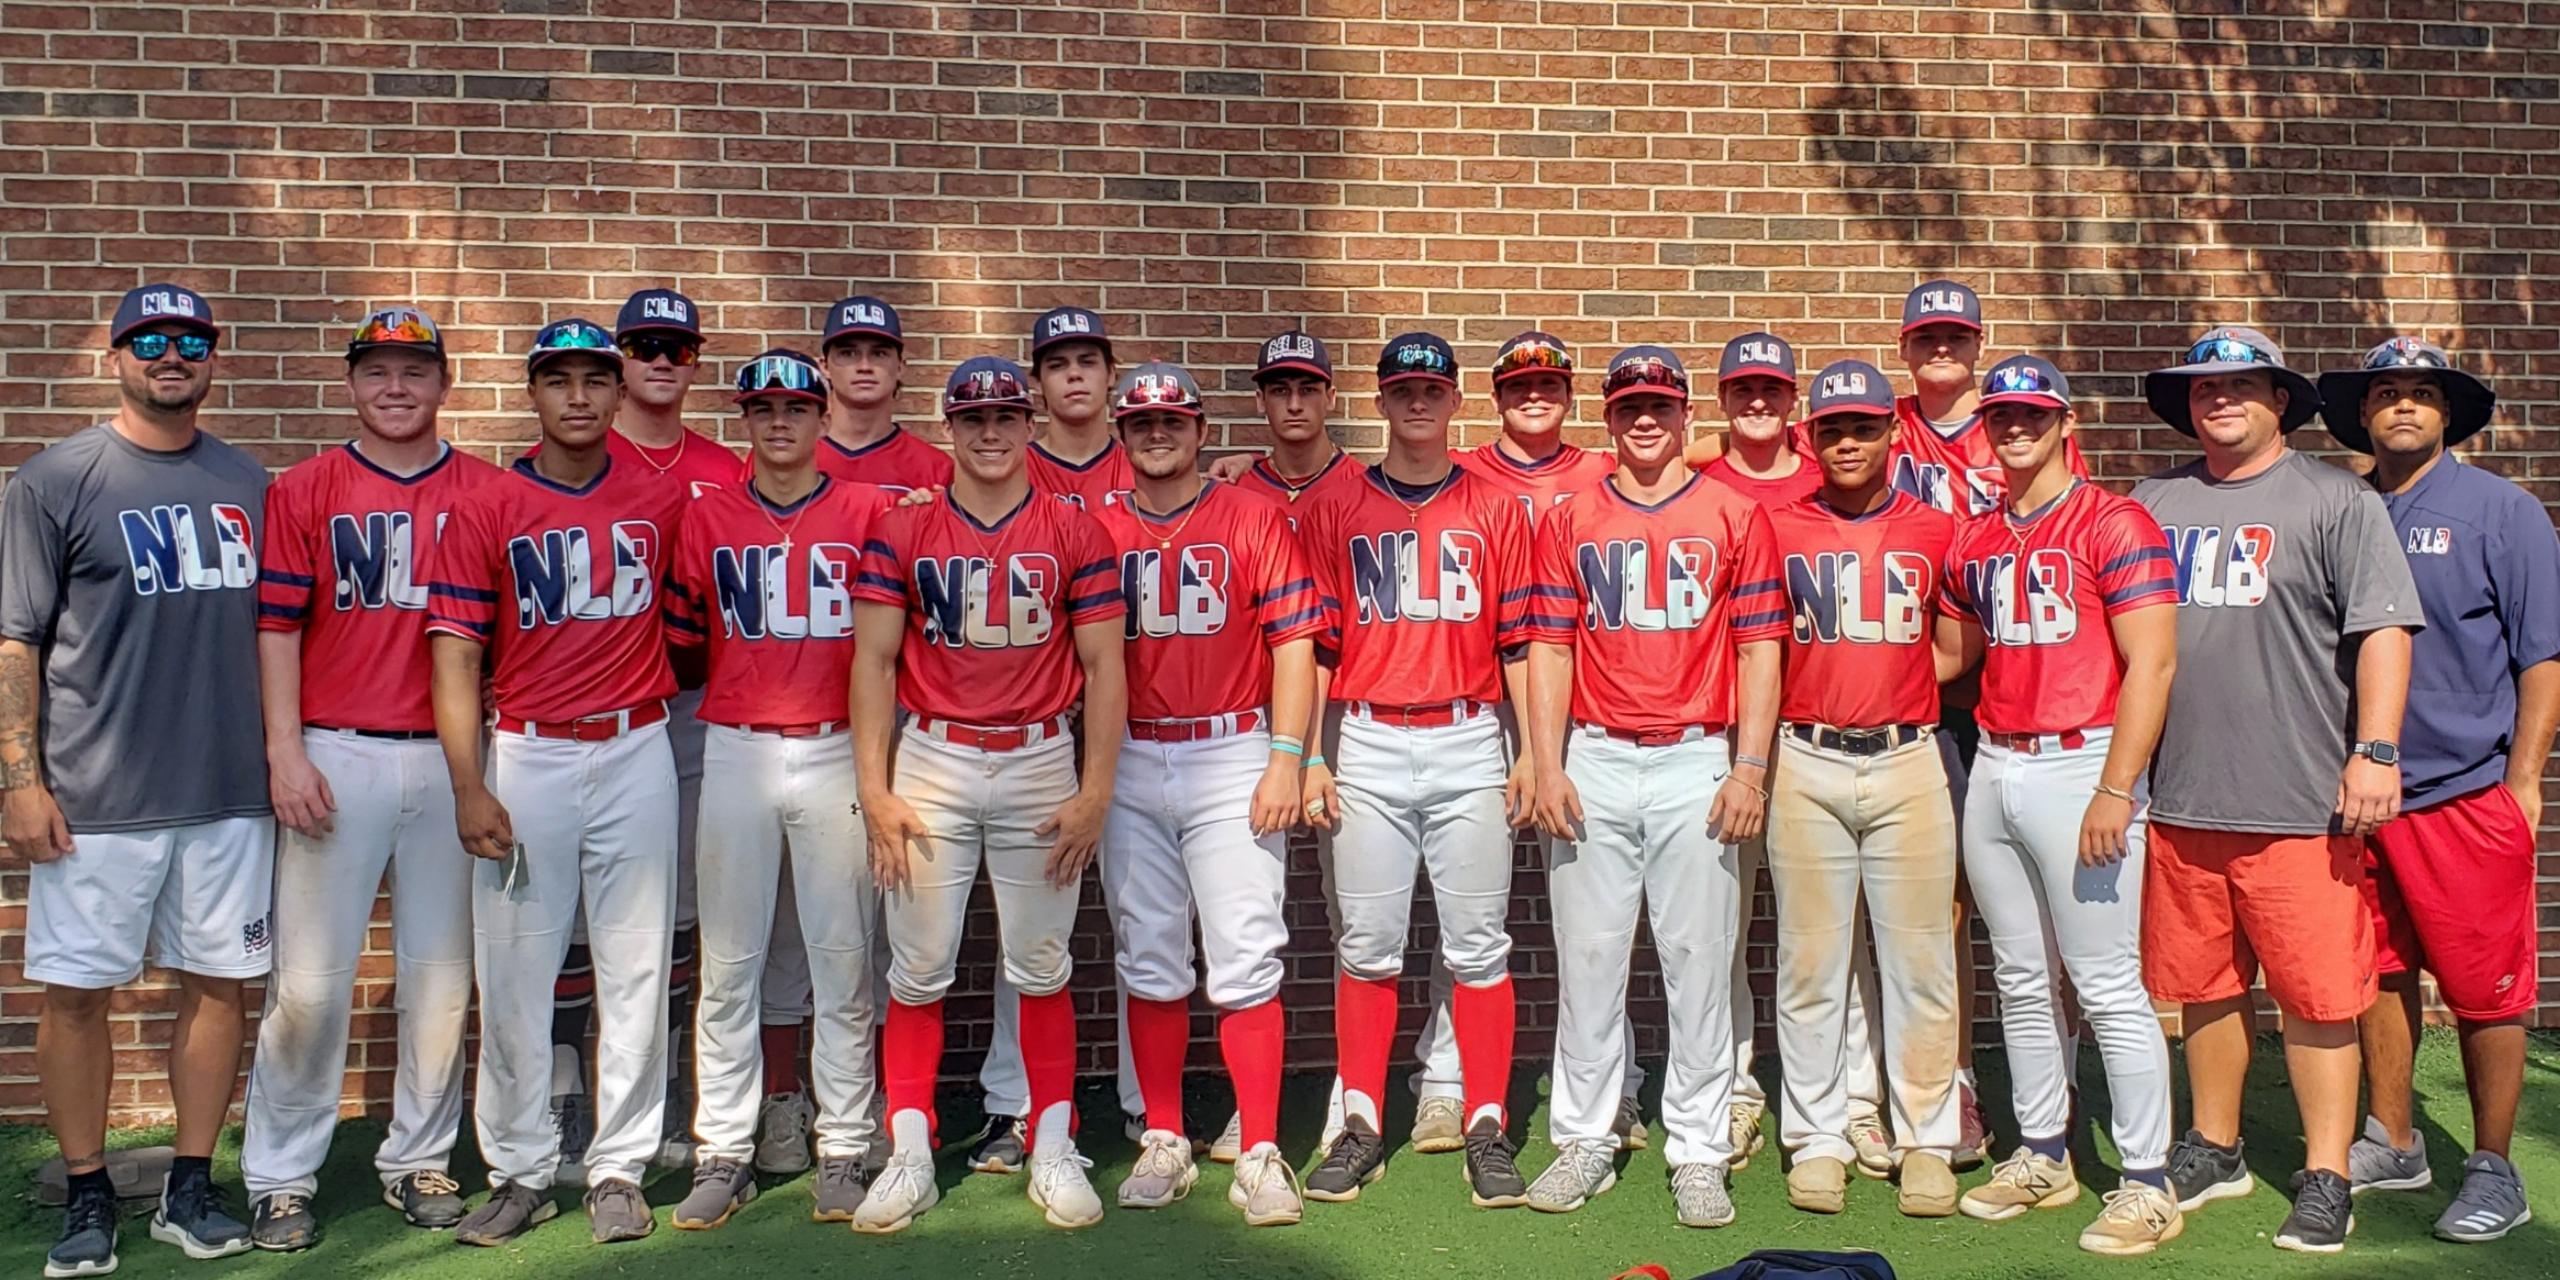 travel baseball team in florida